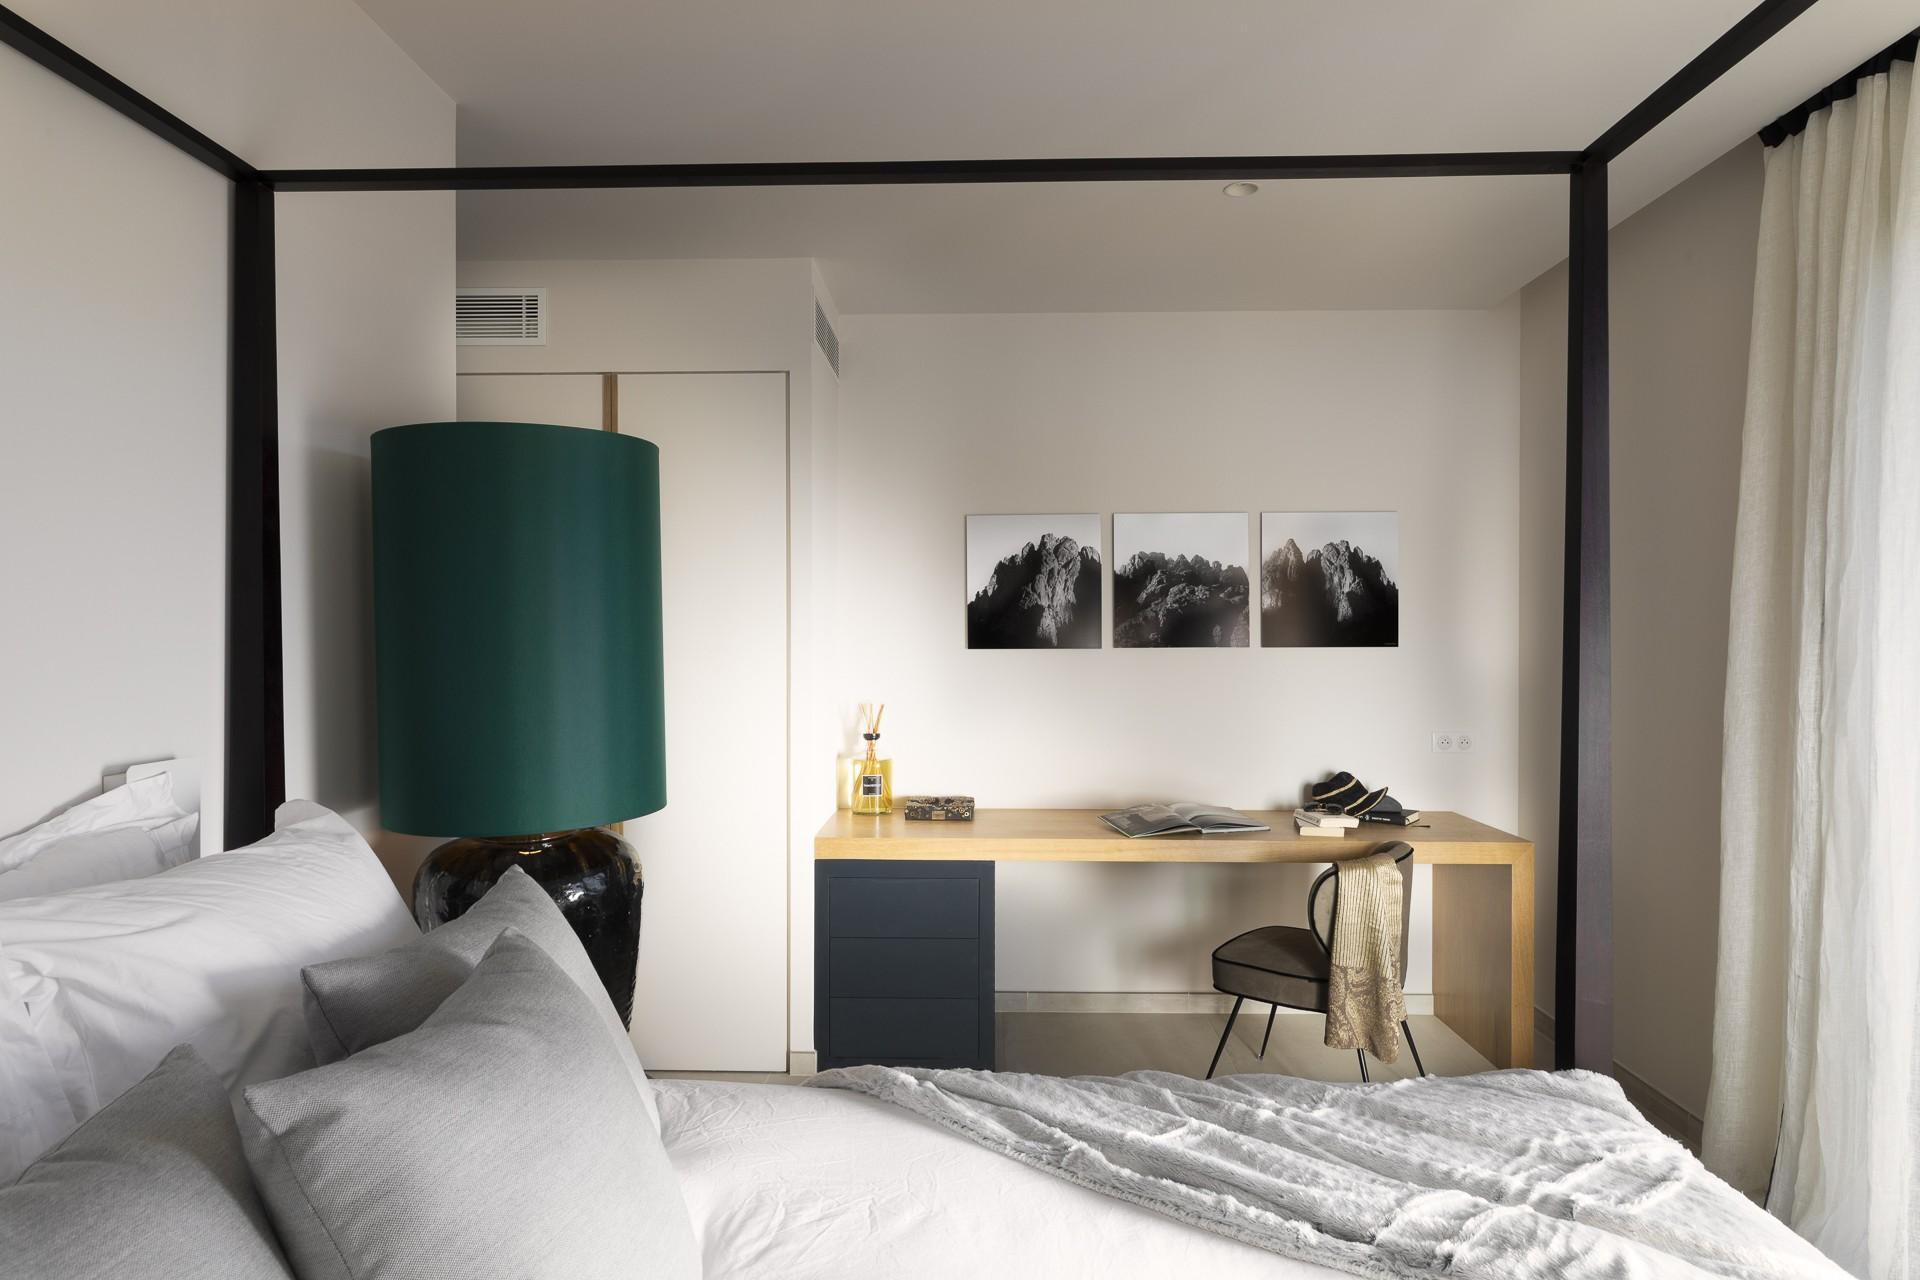 Porto Vecchio Luxury Rental Villa Perle Bedroom 7